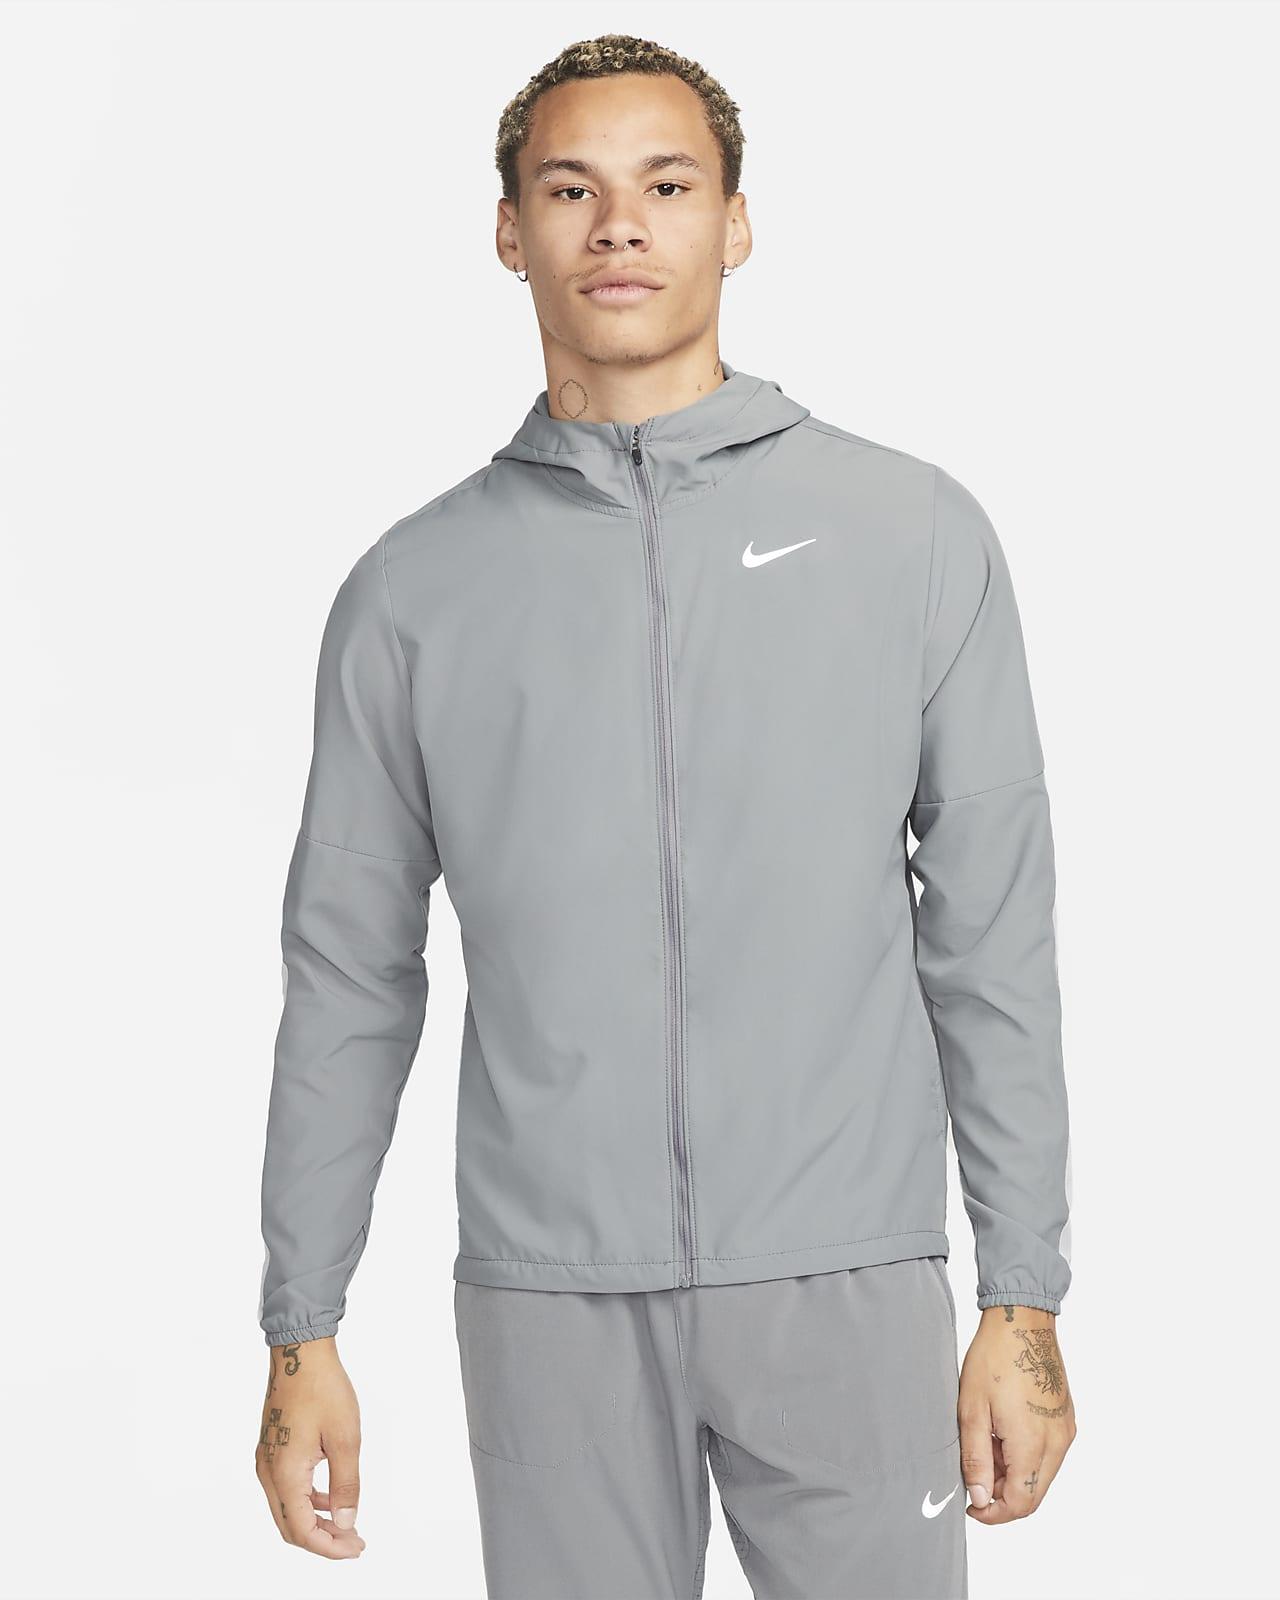 Nike Run Stripe Men's Woven Running Jacket